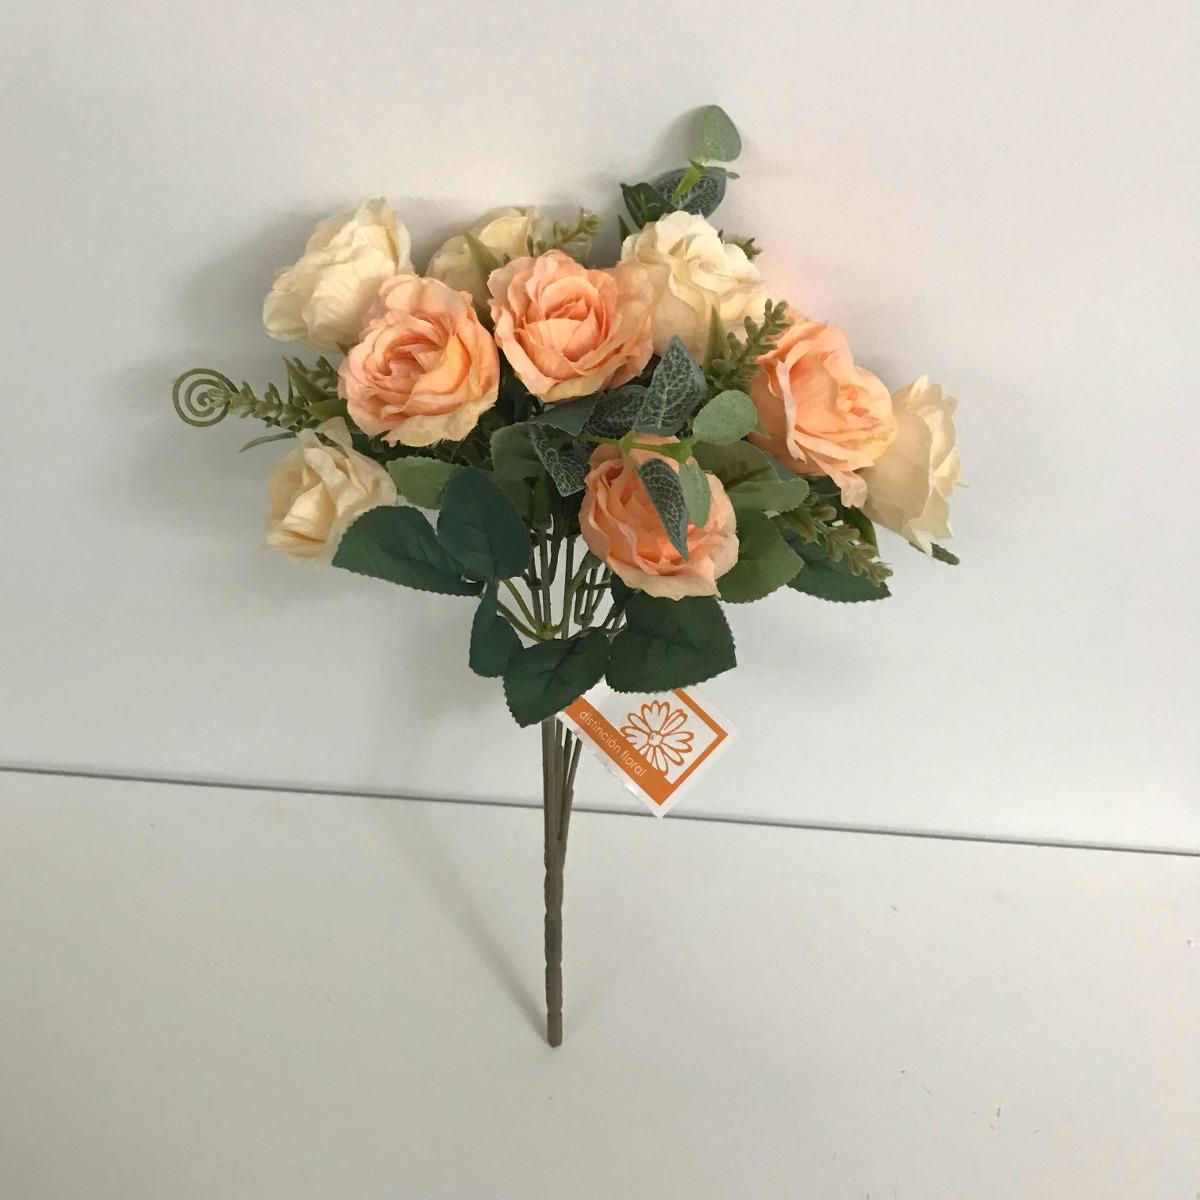 Ramo Bouquet De Rosas Naranja Salmón Con Beige Arreglo Flor